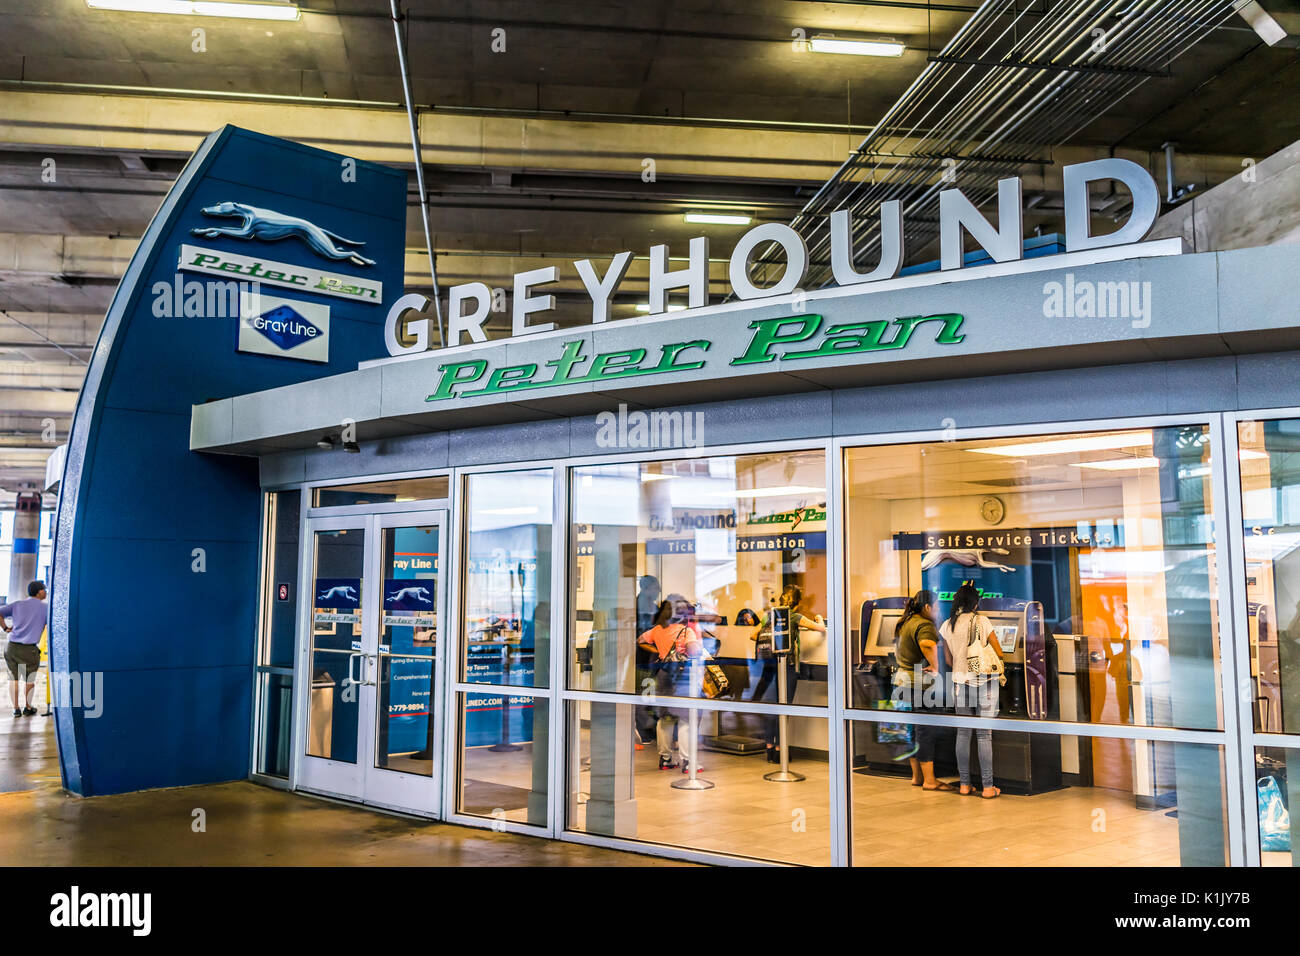 Union Station Bus Terminal Stock Photos & Union Station Bus